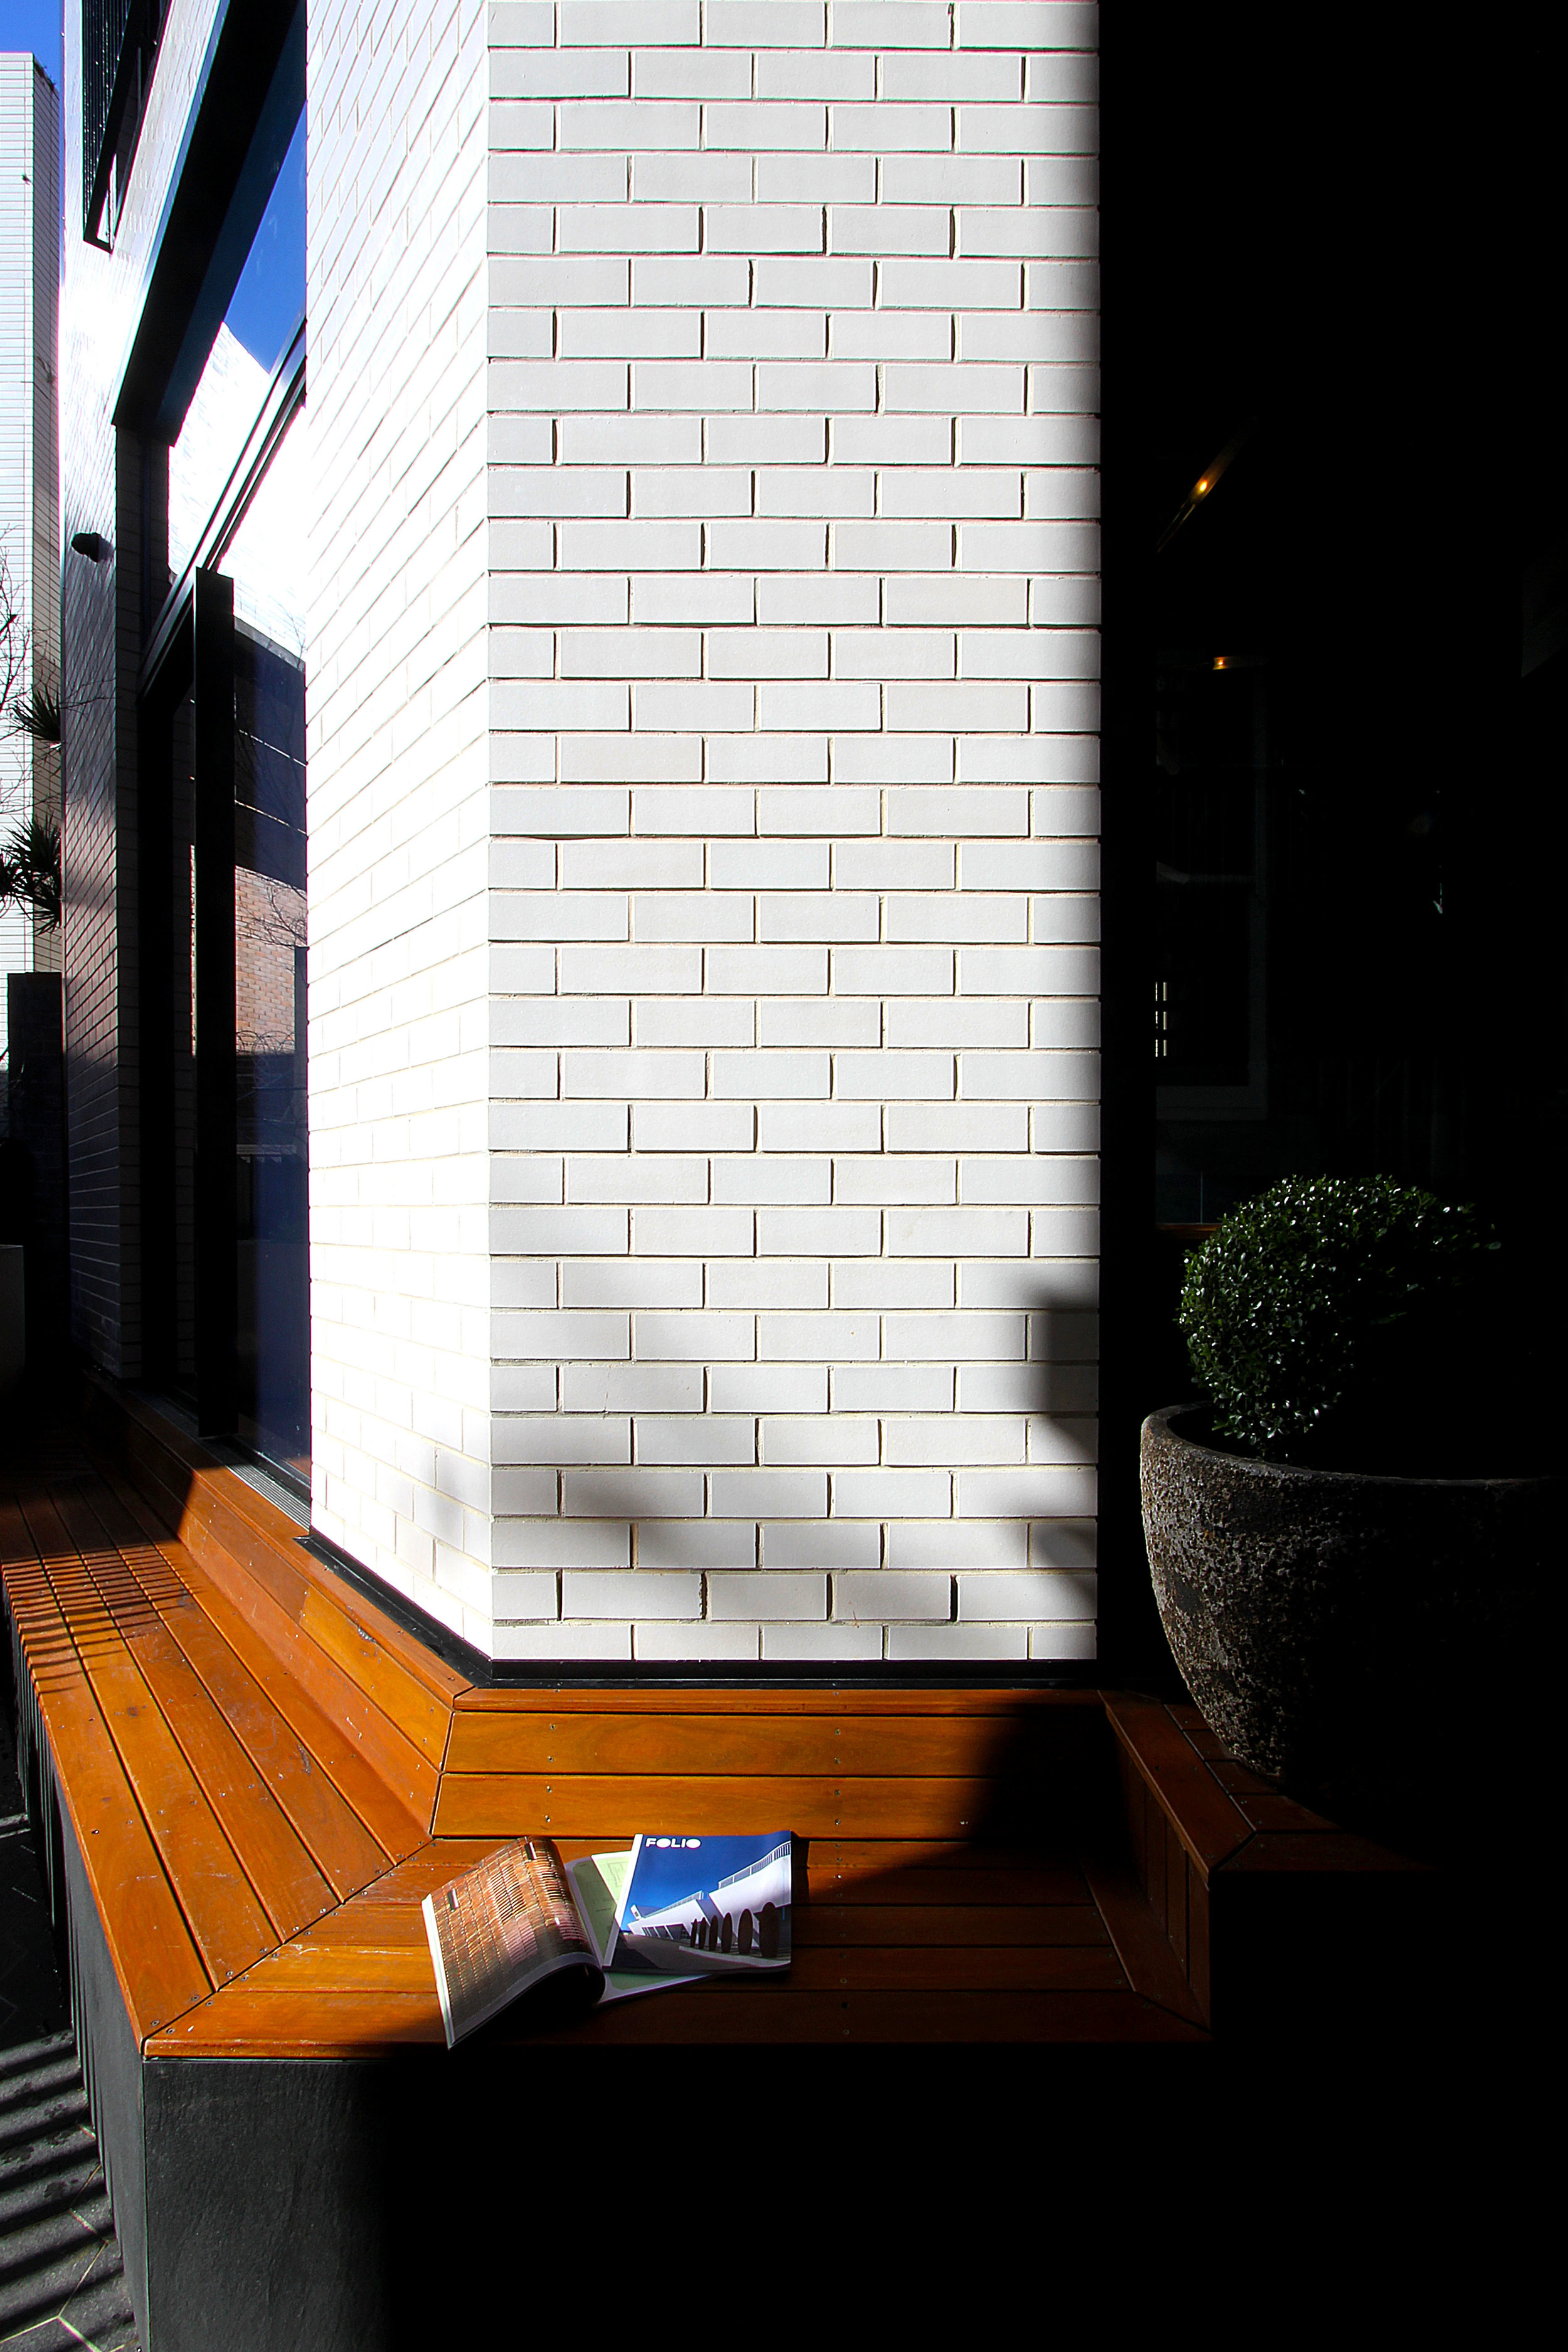 TYA Photography | Little Albion Guest House | Brickwork | Winter | Morning 01 | A9068.jpg